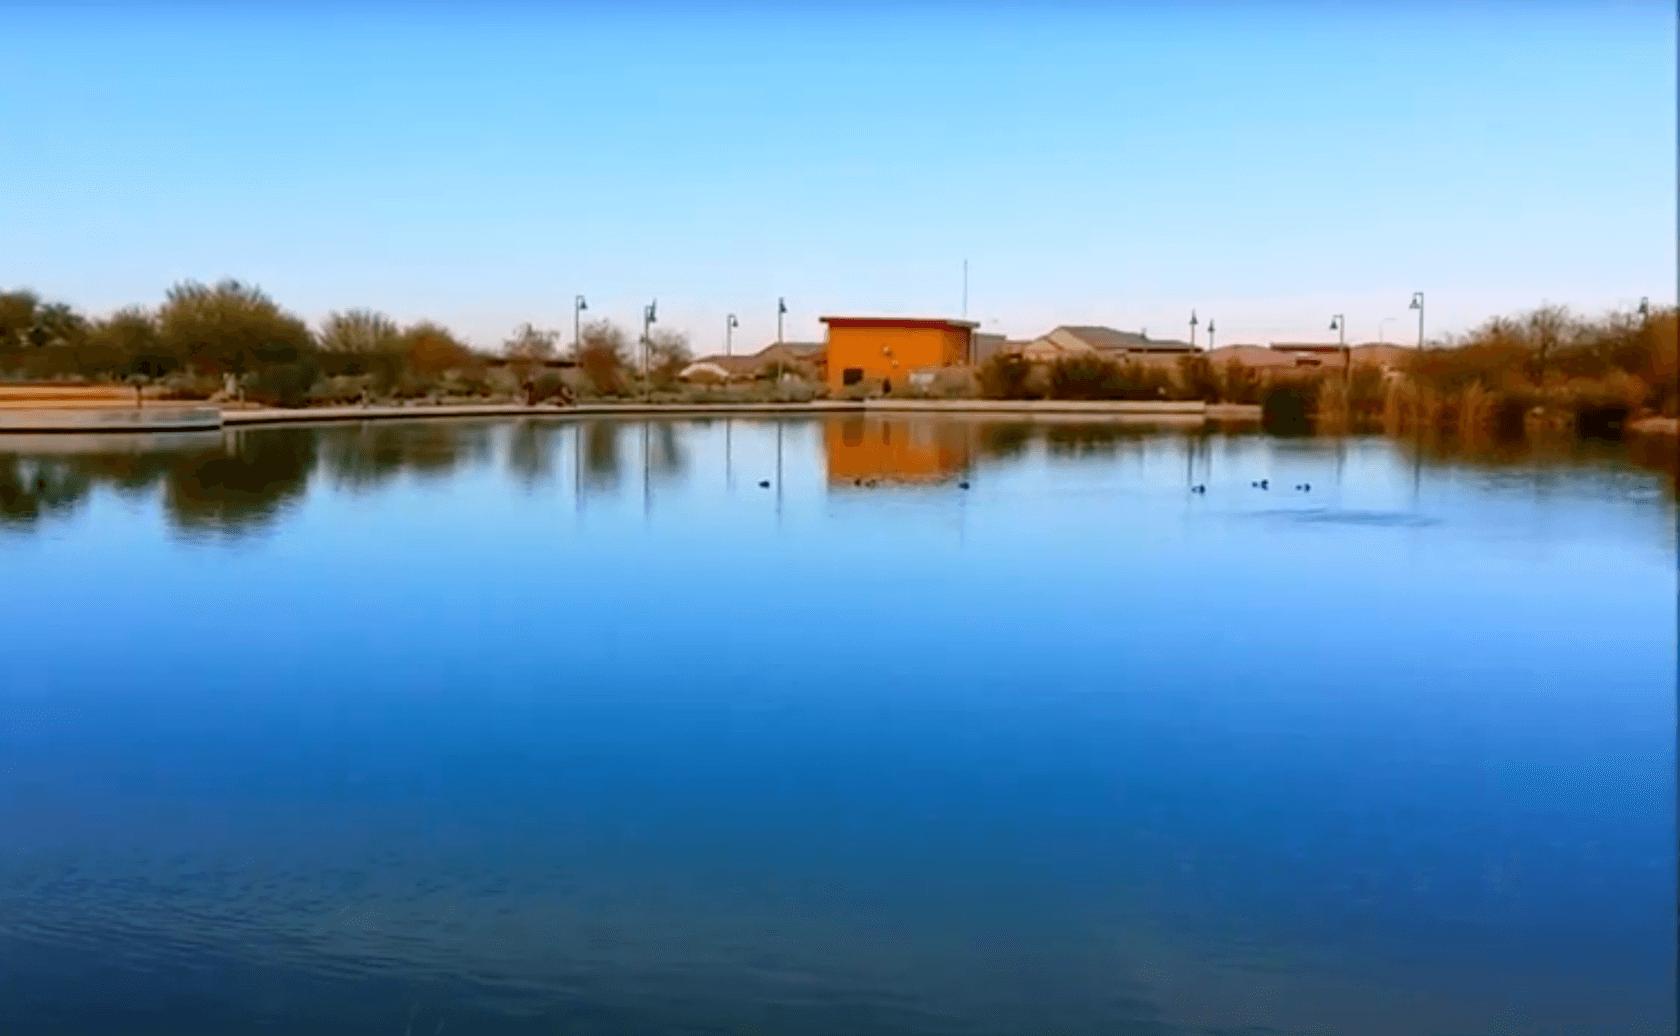 Veterans-Oasis-Community-Lake-Fishing-Guide-Chandler-AZ-01